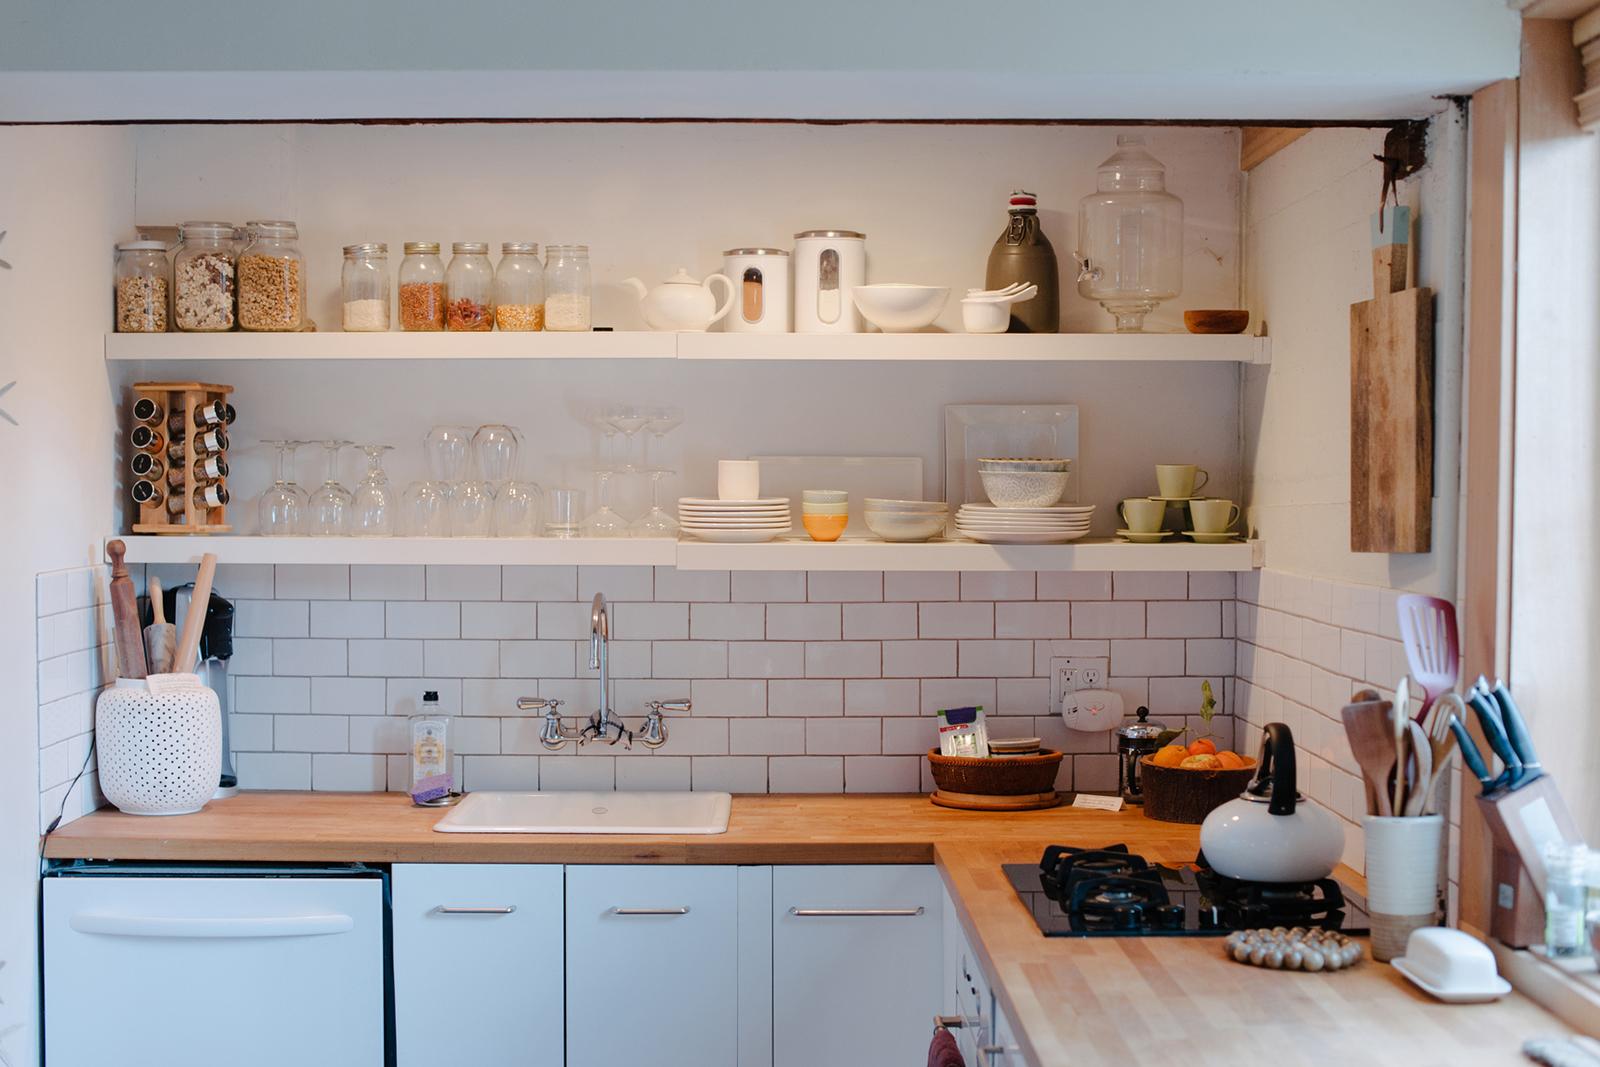 How To Design A Kitchen Kitchen Layout Ideas Houselogic